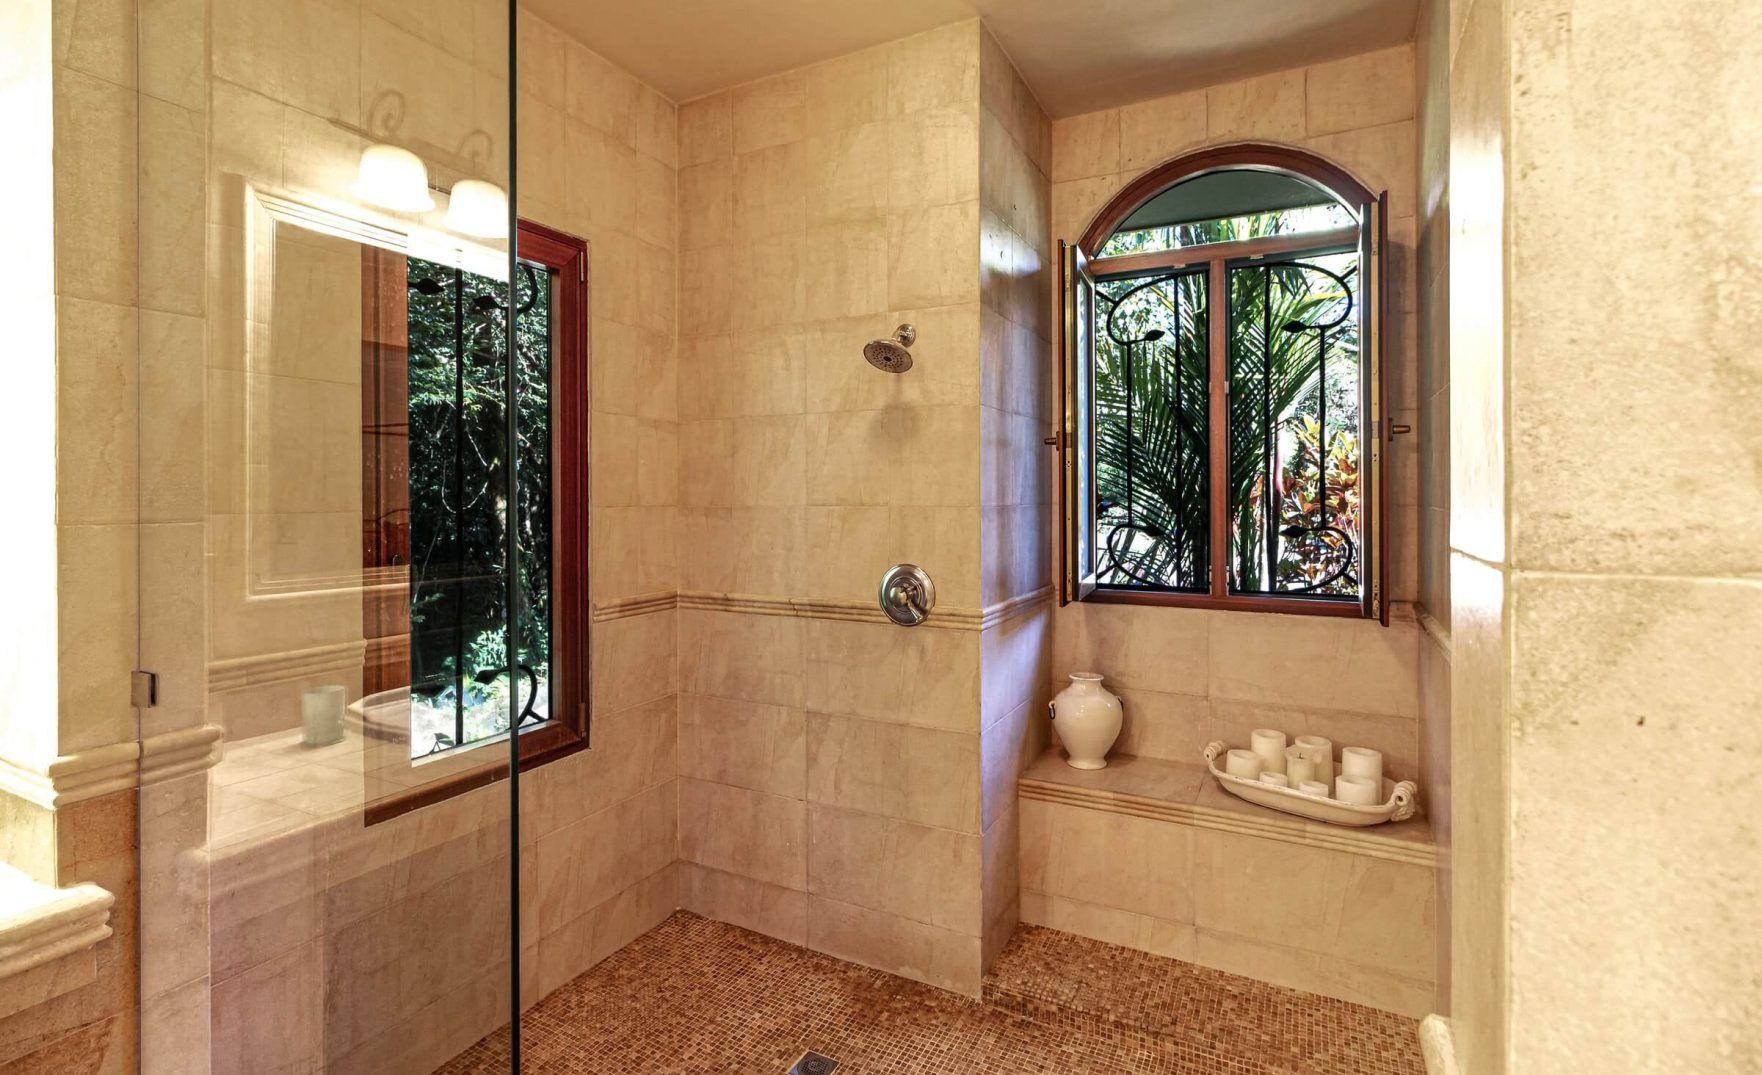 tile walk-in shower